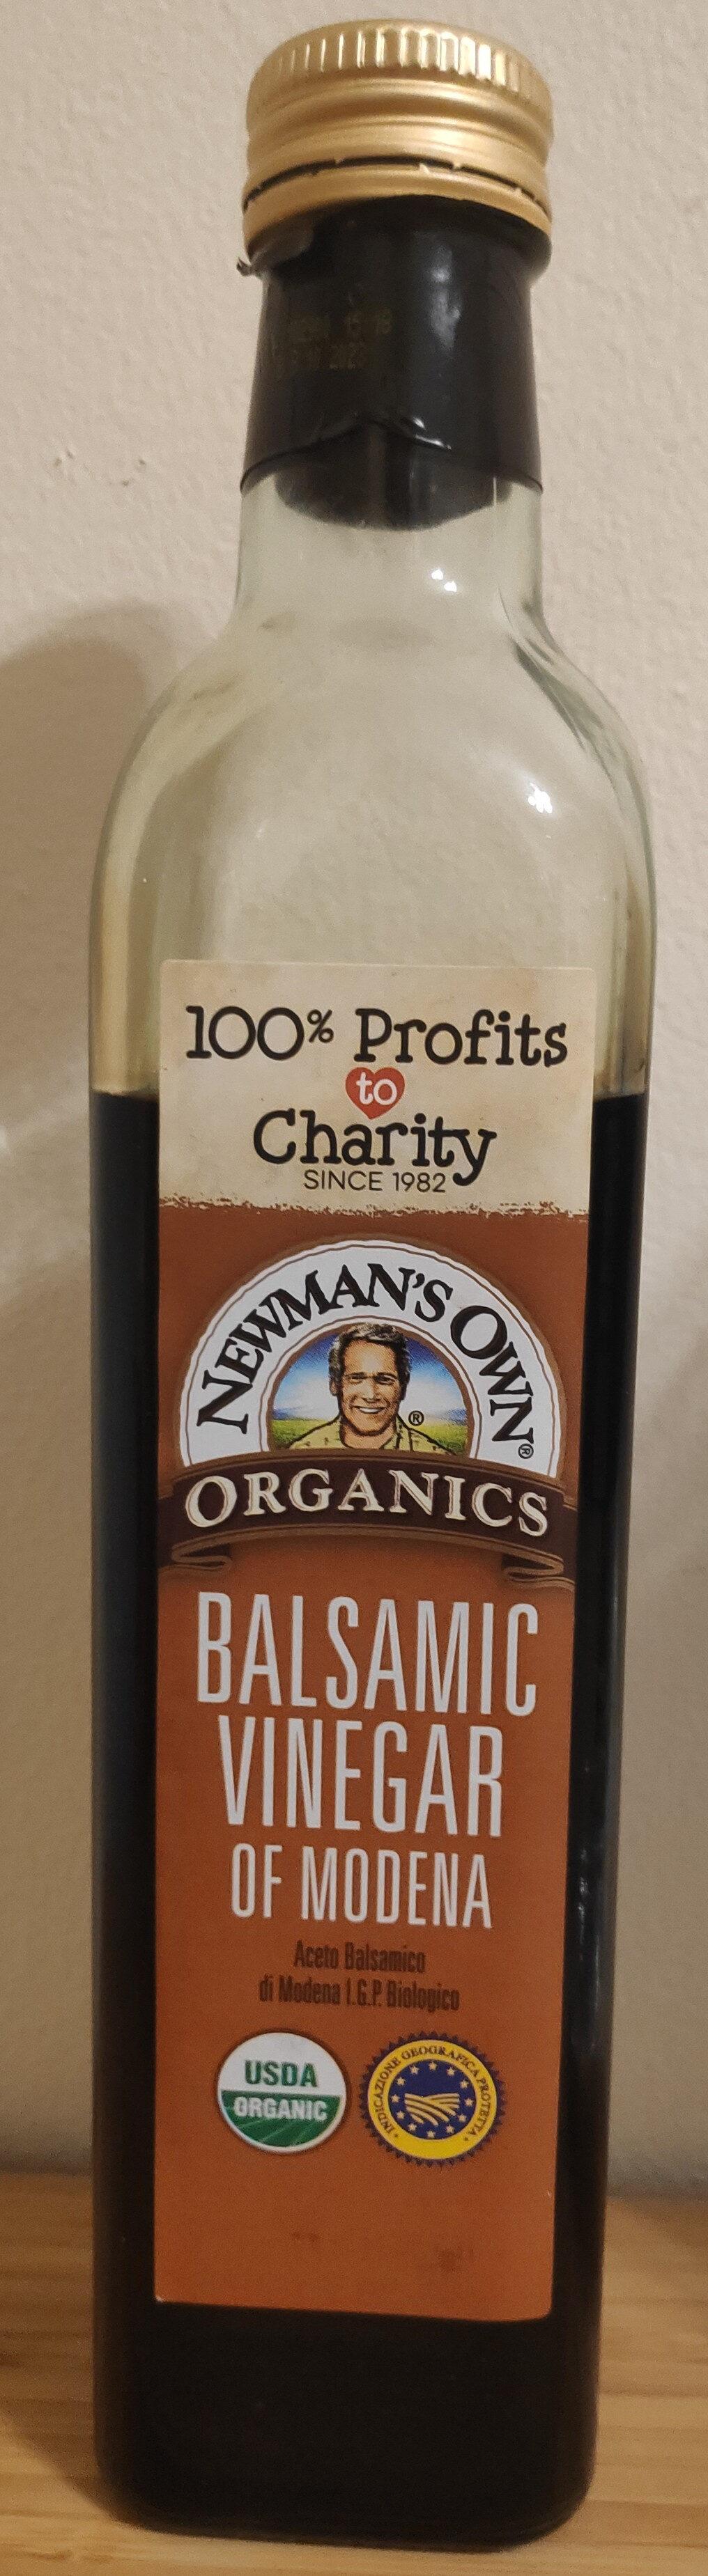 Organic Balsamic Vinegar of Modena - Product